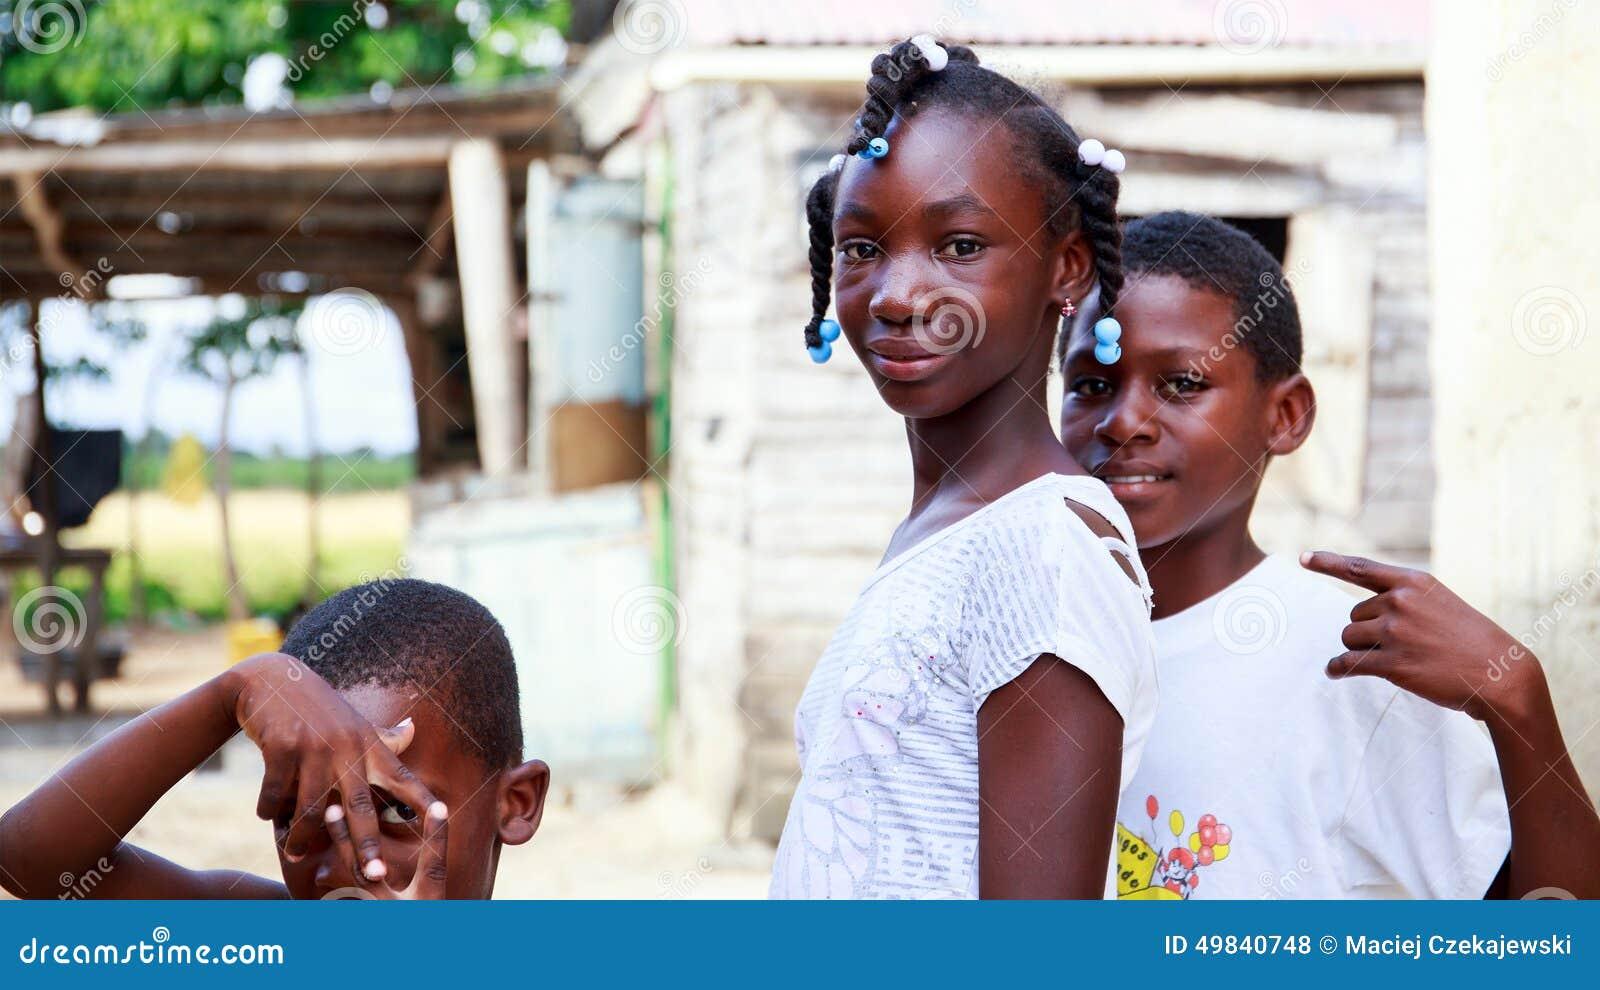 Haitianische Kinder im Flüchtlingslager